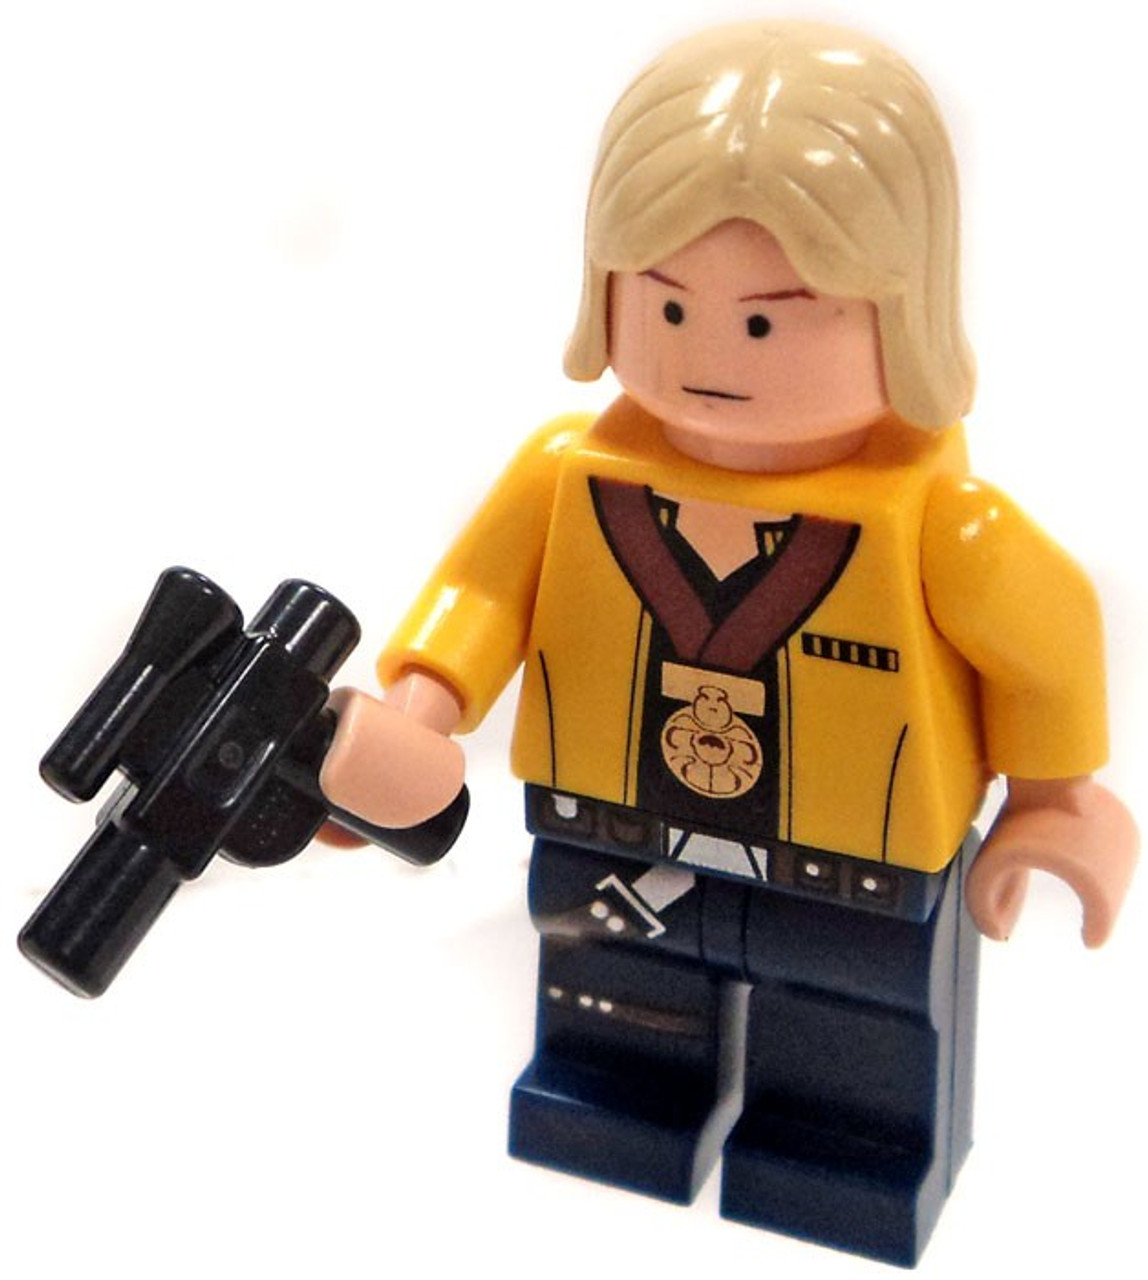 Lego Star Wars Loose Luke Skywalker Minifigure Celebration Loose